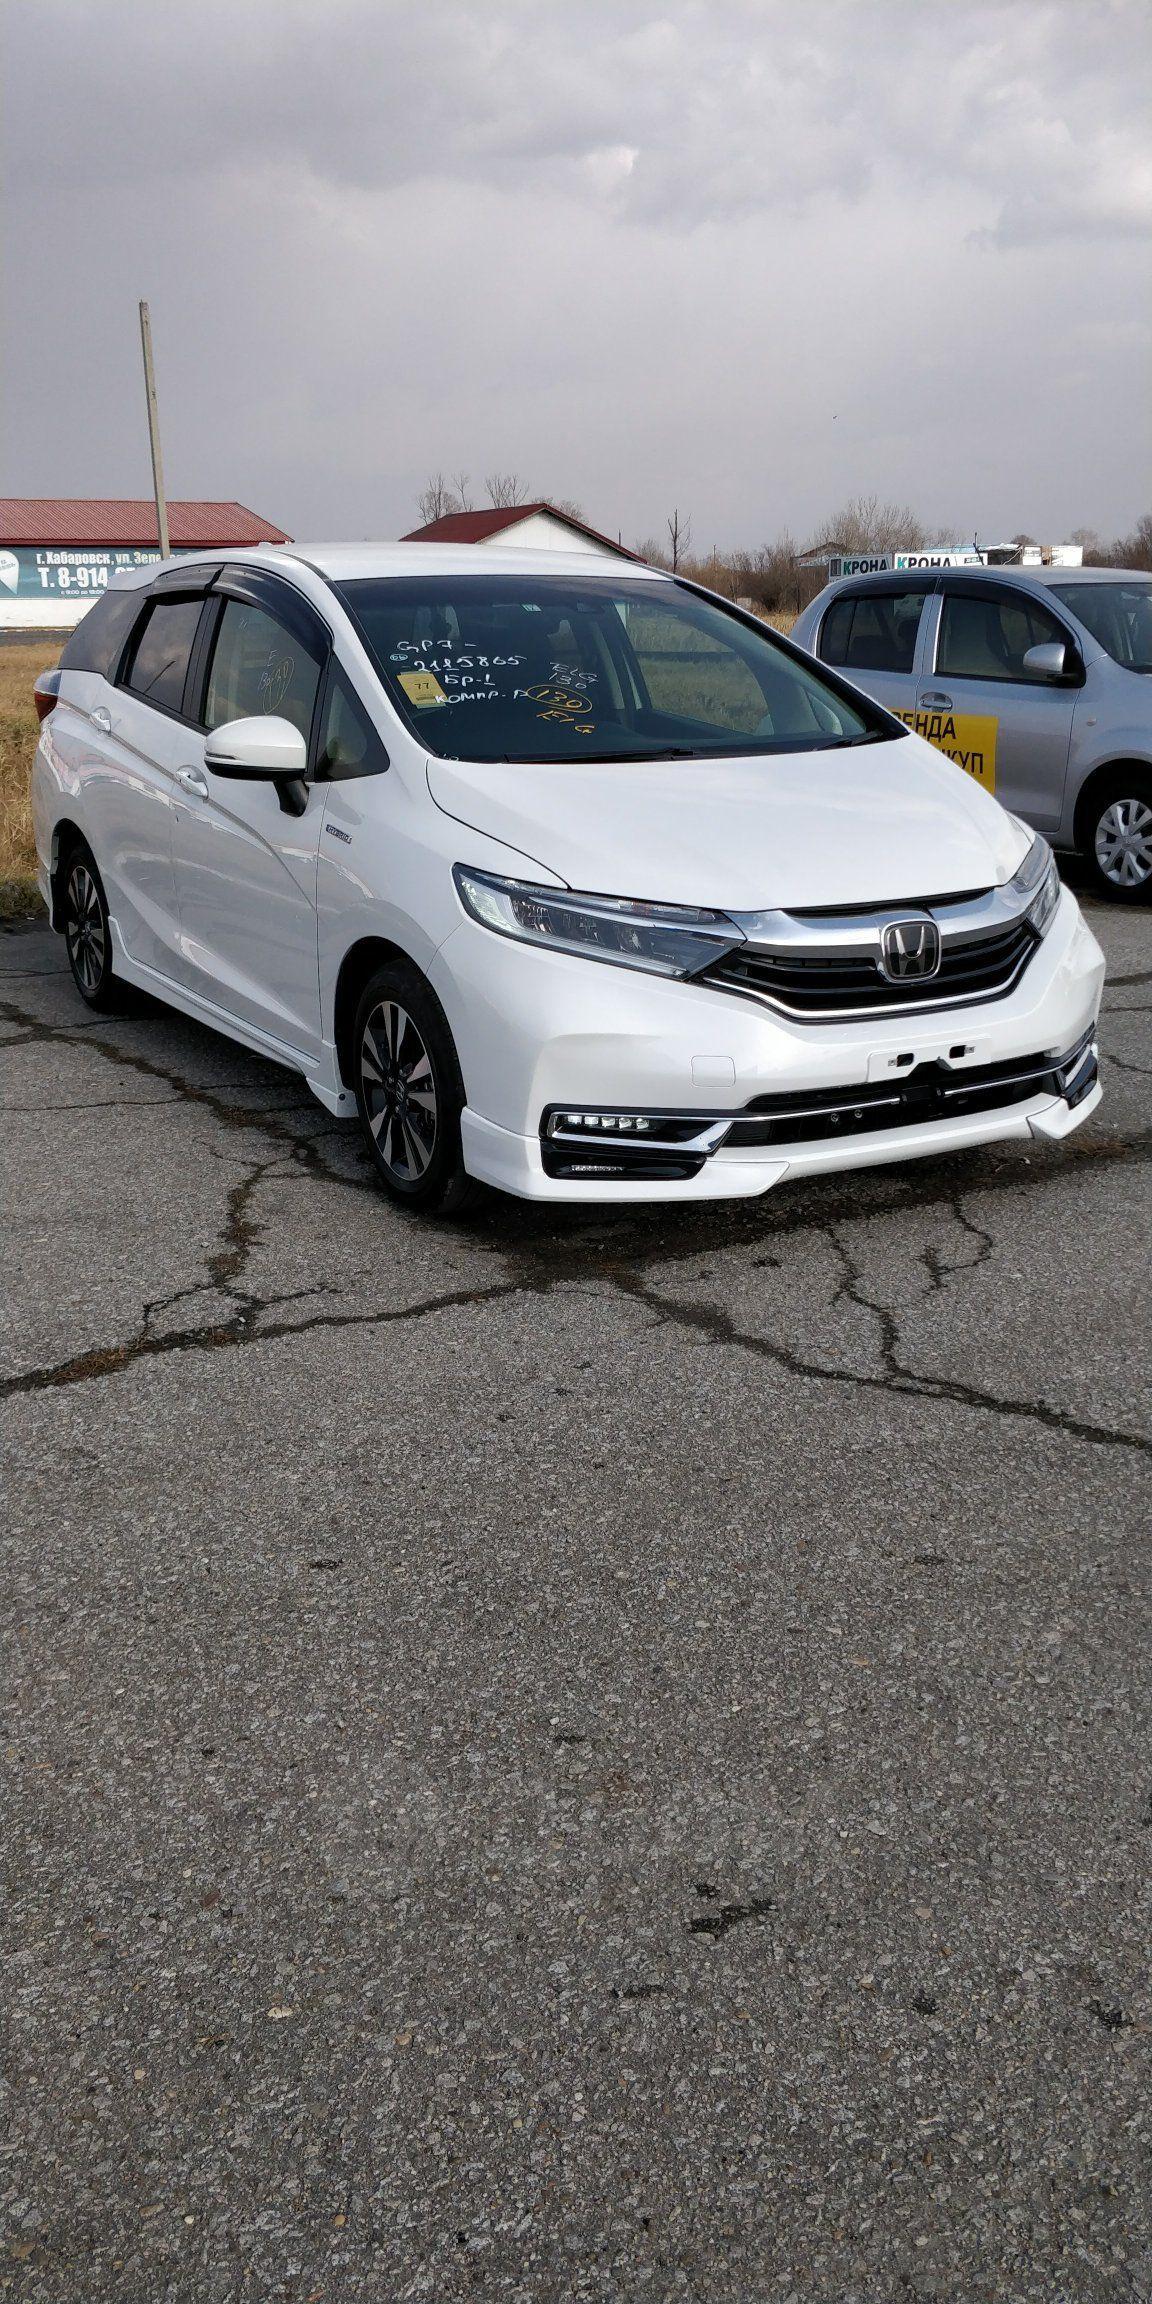 Продажа авто Хонда Шаттл 2020 в Хабаровске, HONDA SHUTTLE ...